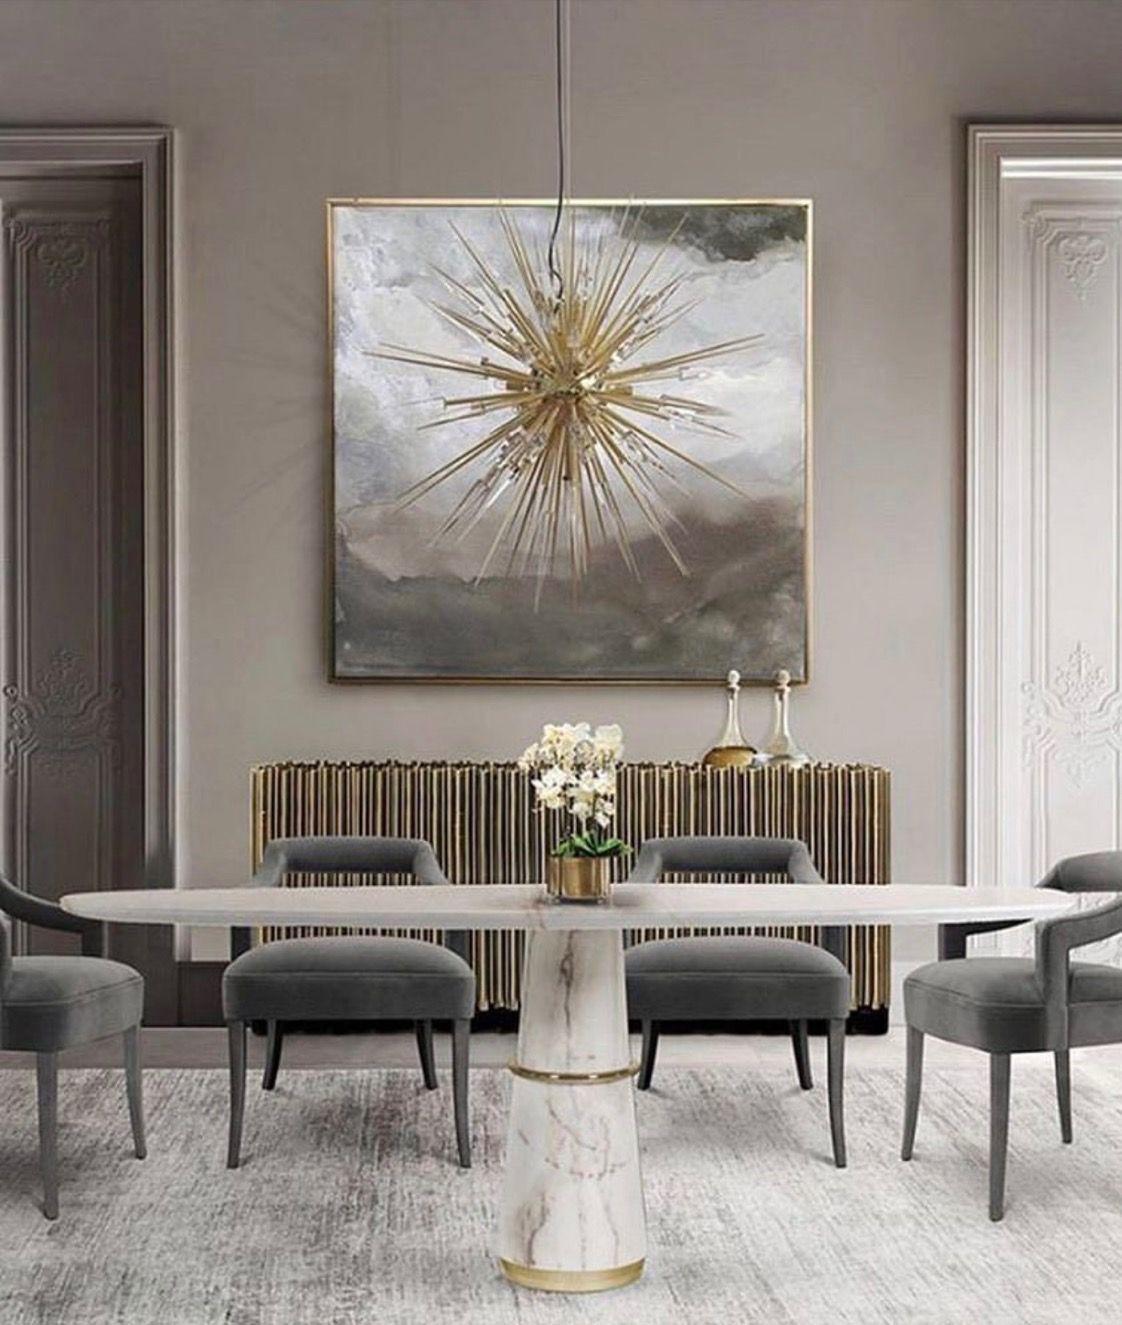 Trendy Design For Luxury Dining Room Decor Ideas You Must Know Discover More Room Design Details And Design I Domashnij Dekor Dizajn Doma Mebel Dlya Stolovoj